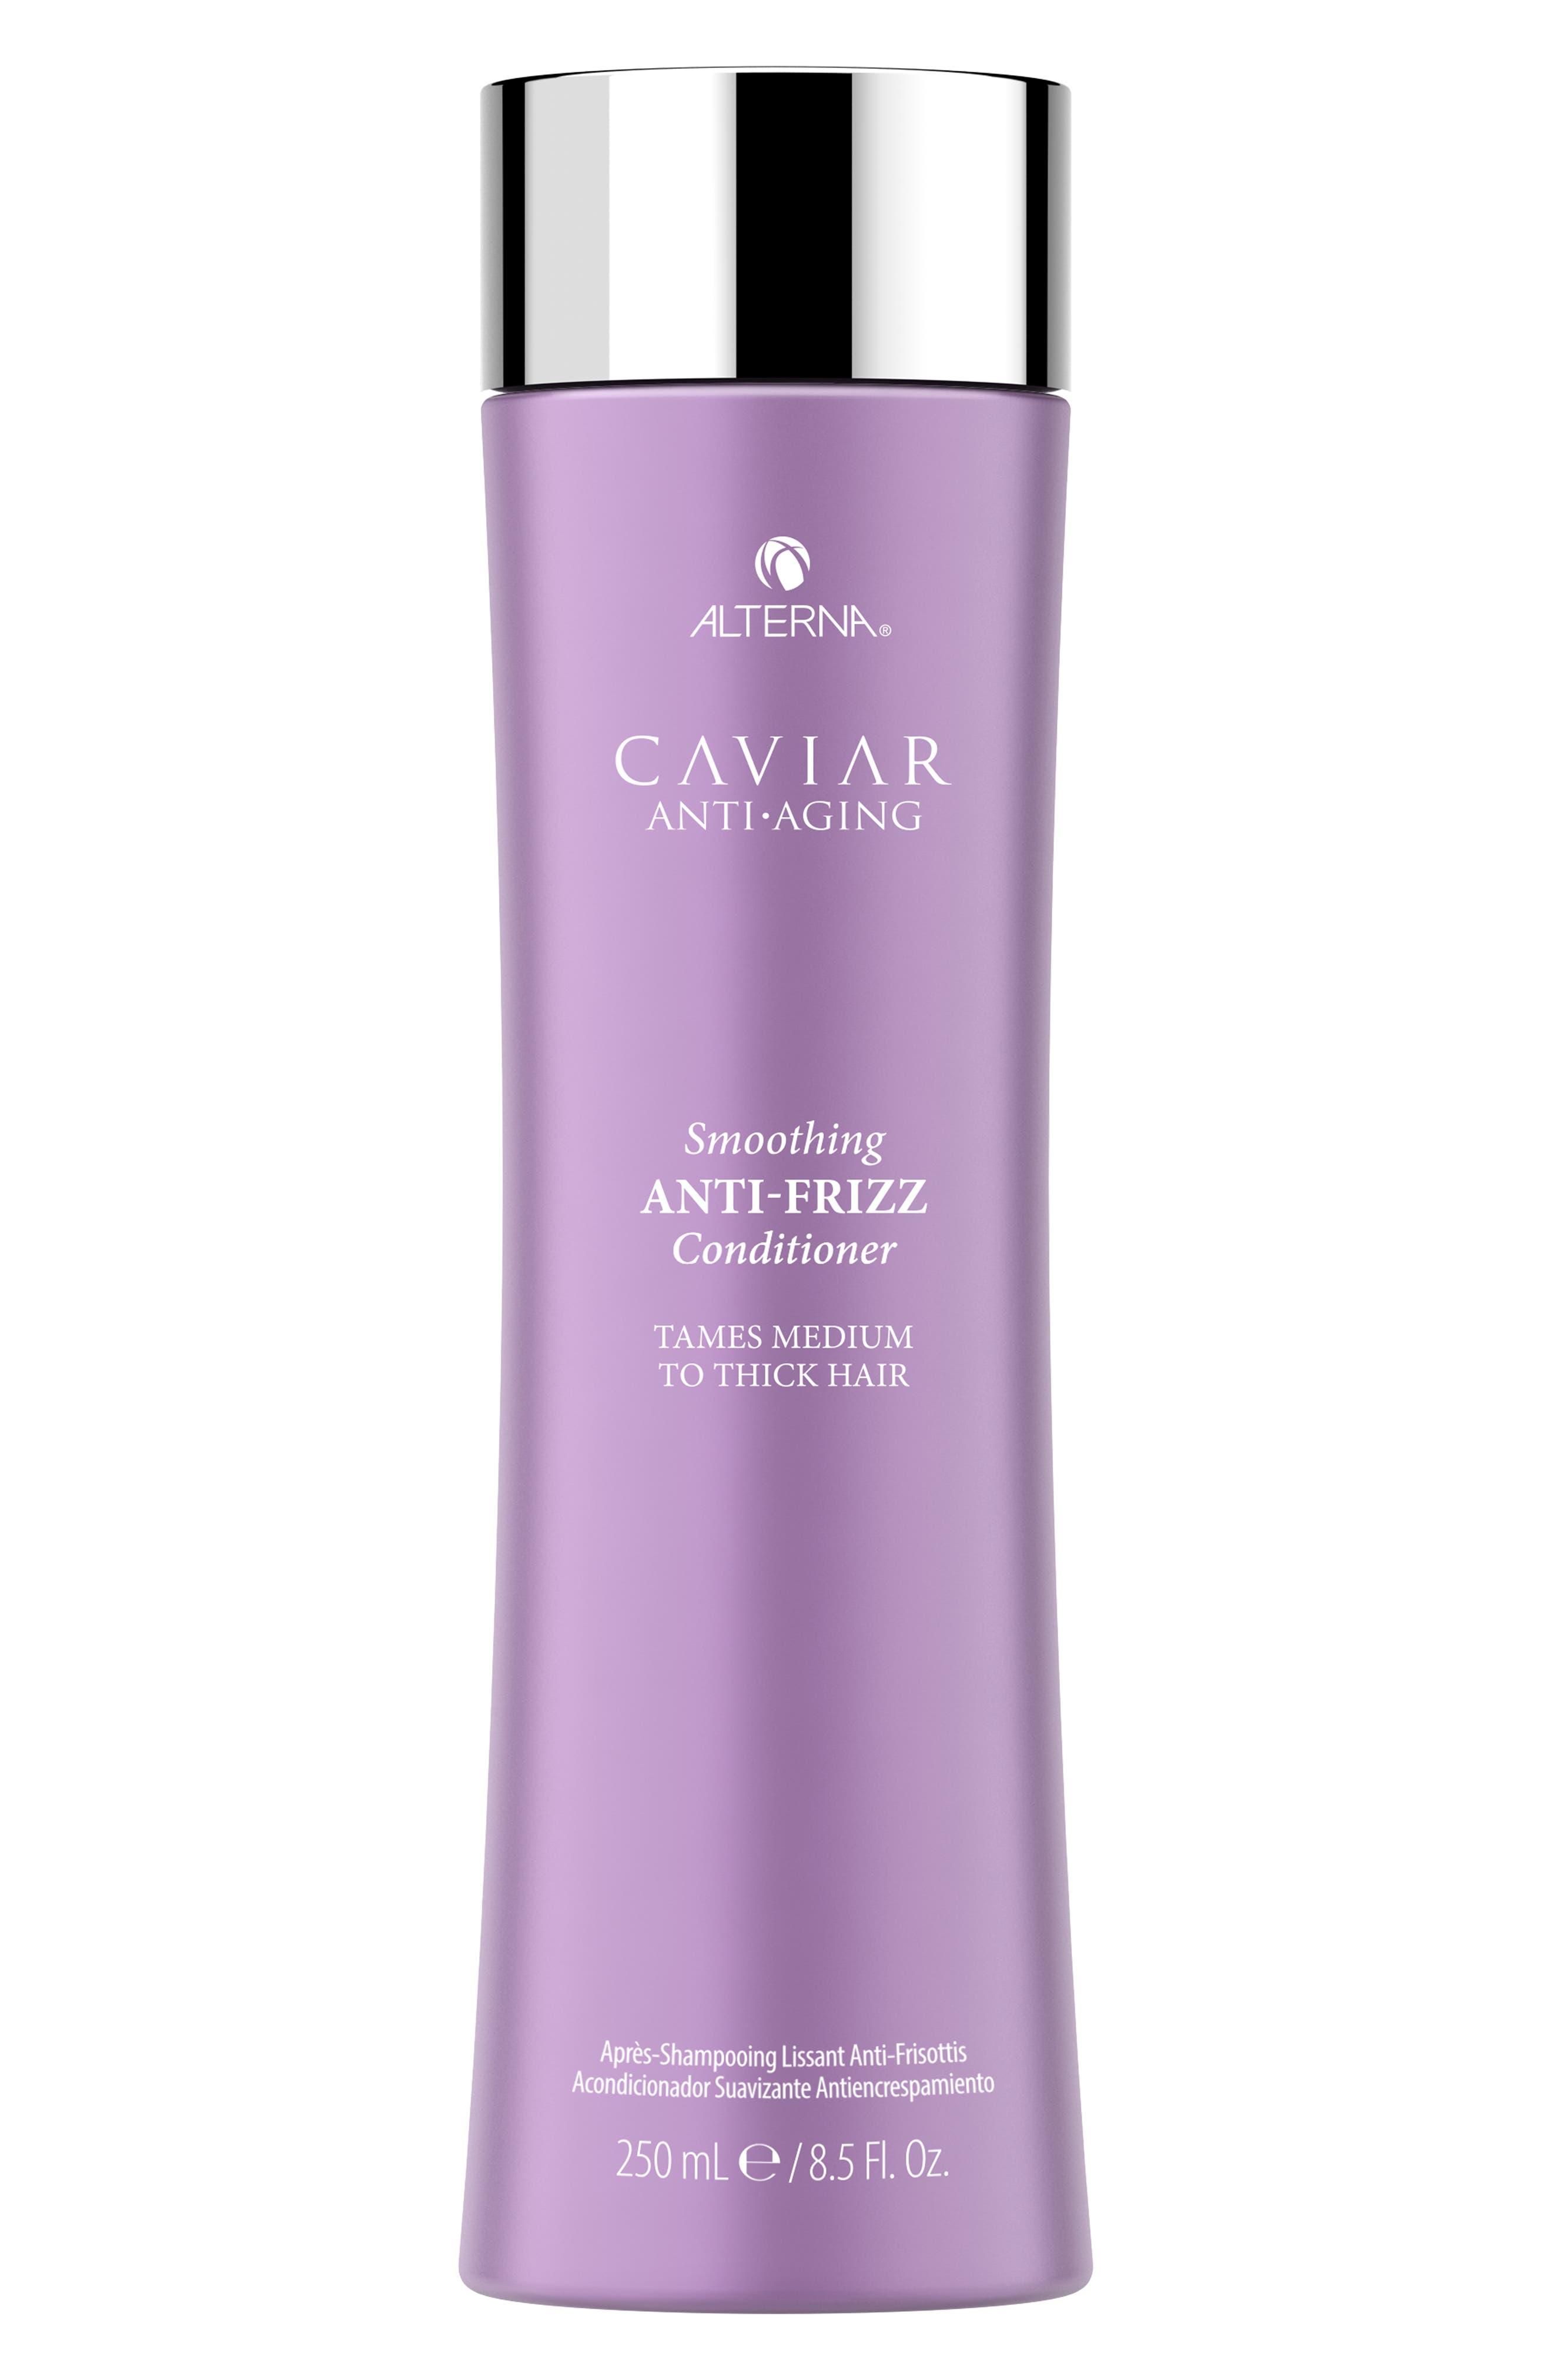 Alterna Caviar Anti-Aging Smoothing Anti-Frizz Conditioner